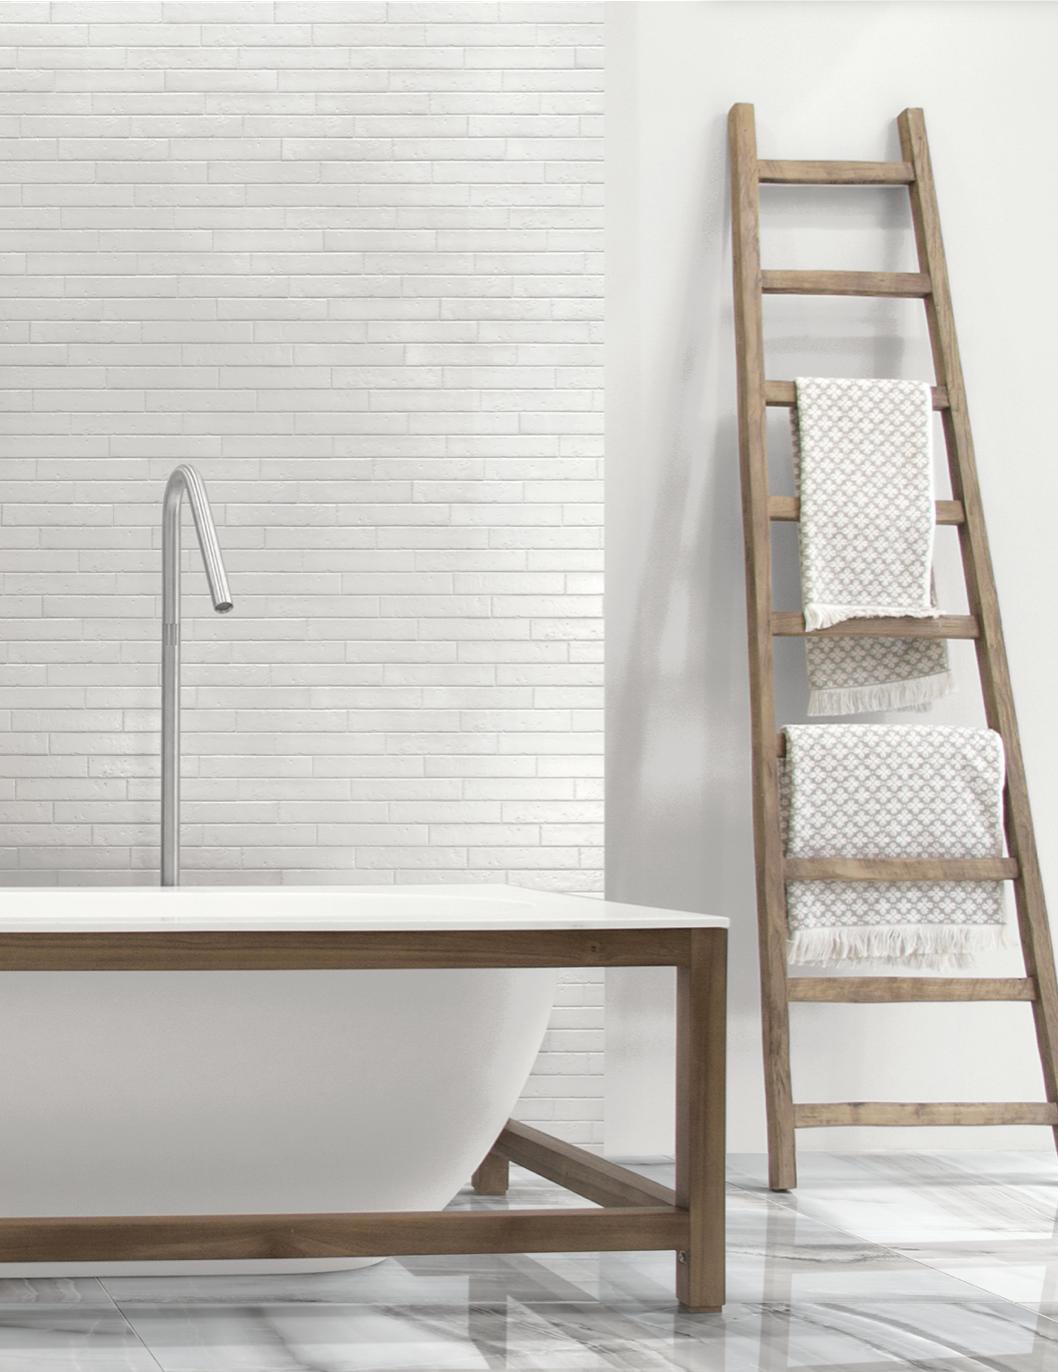 Ceramique mur salle de bain antique blanc